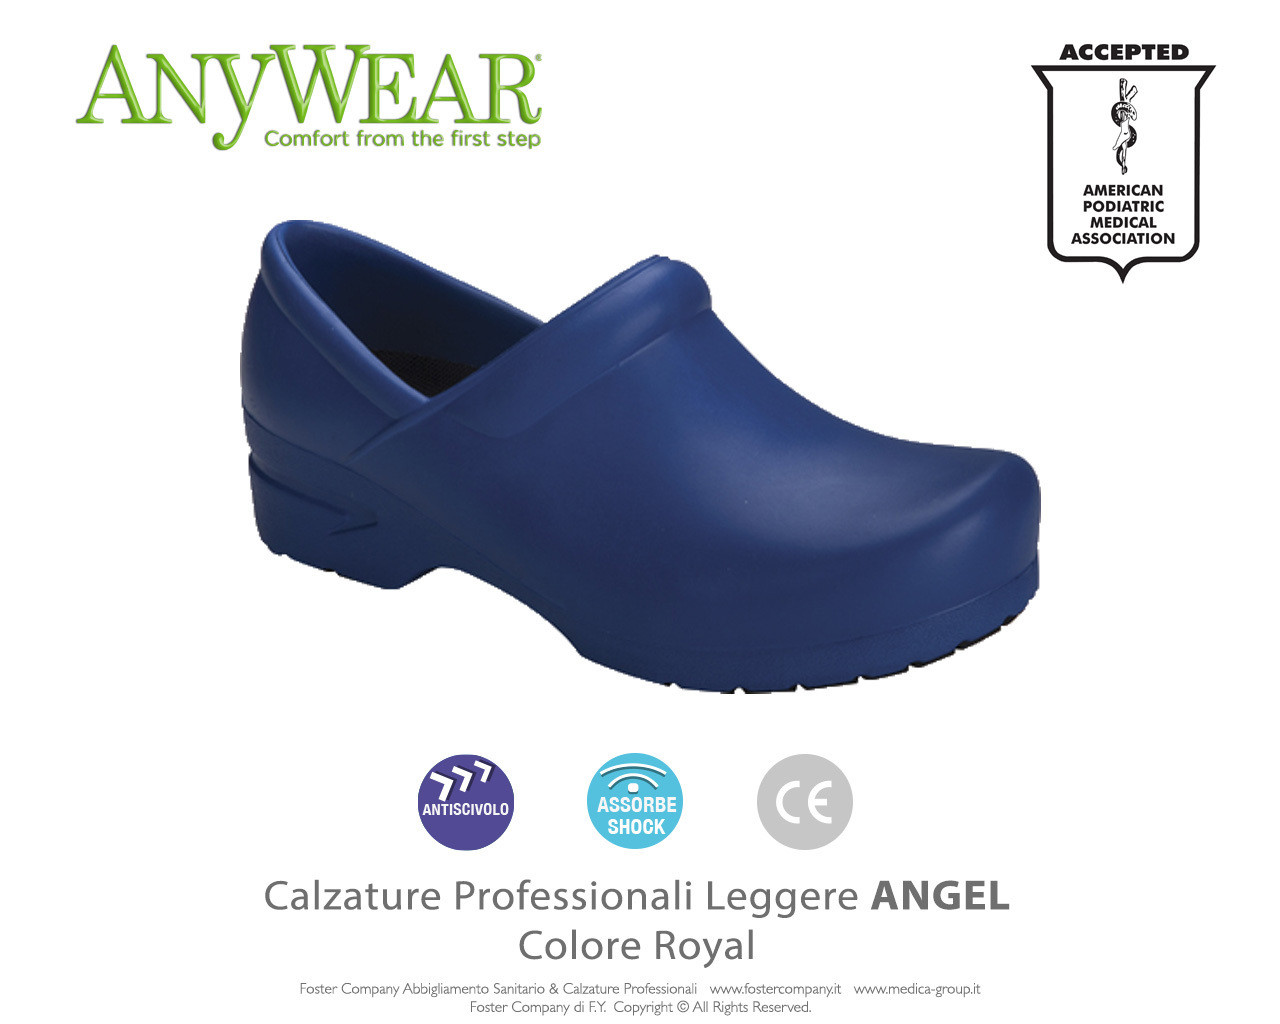 Calzature Professionali Anywear ANGEL Colore Royal - COLORE DI FINE SERIE